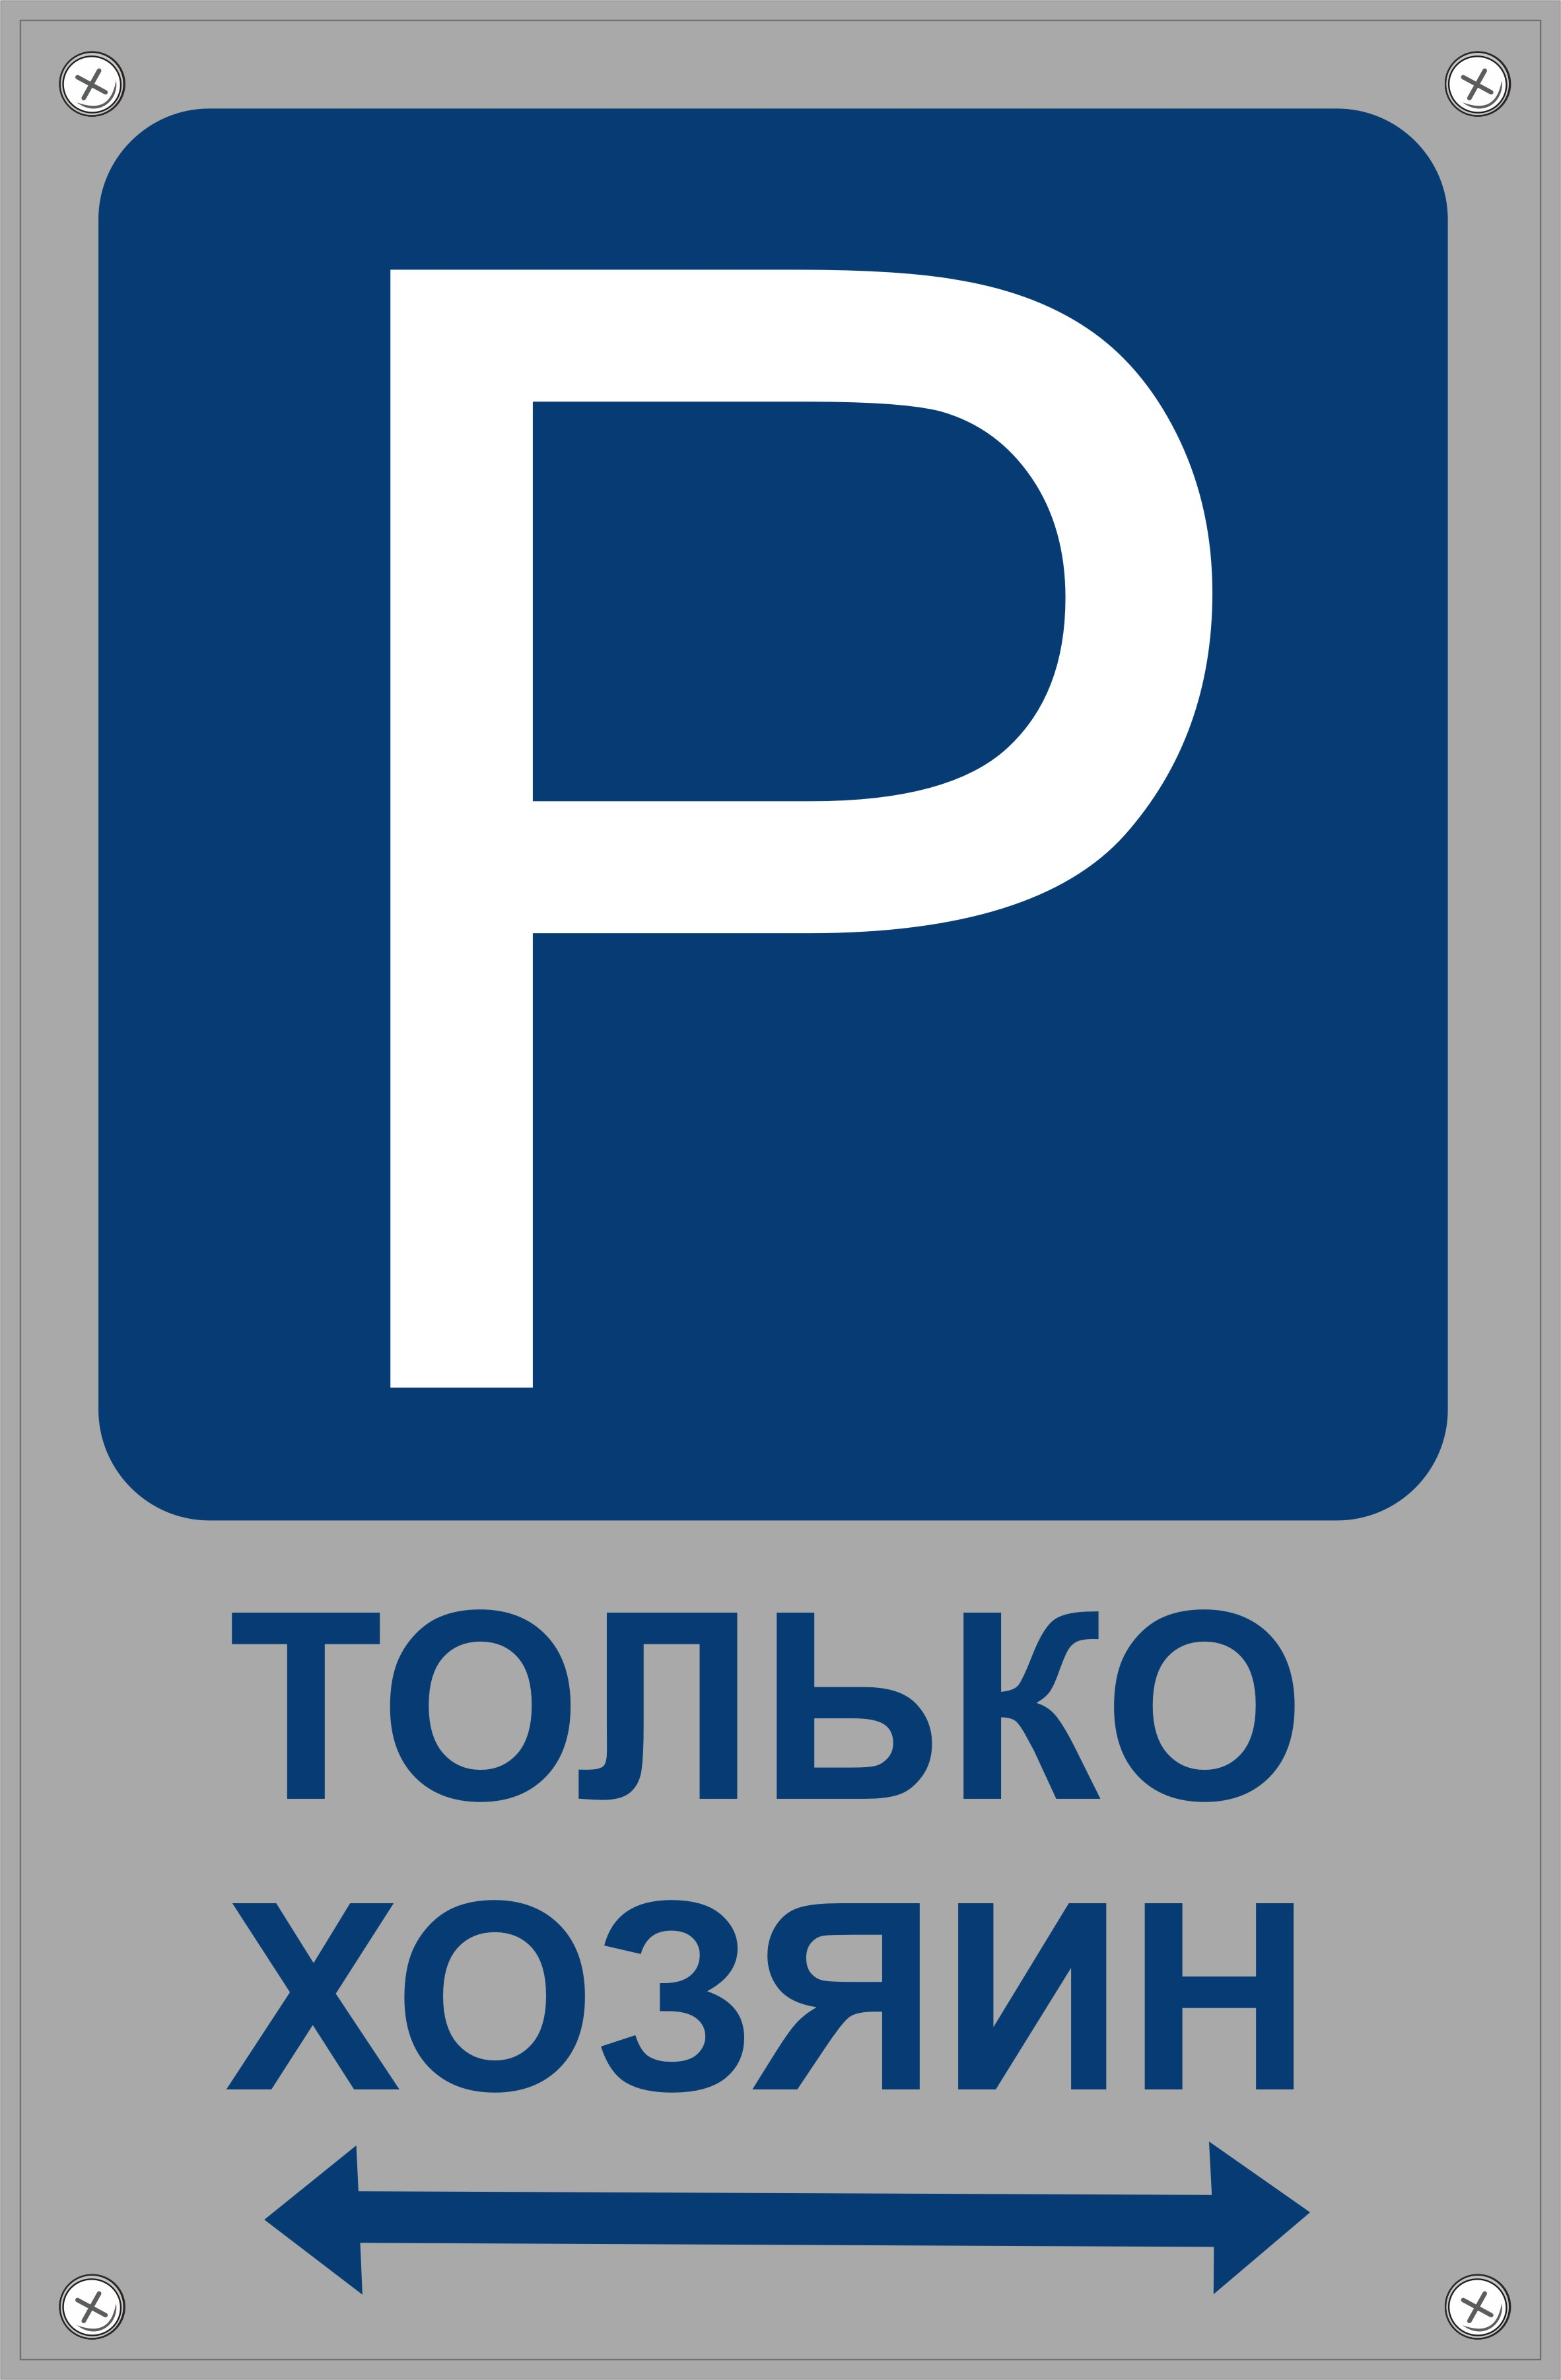 Табличка TPS 014 Парковка хозяин, пластик 3 мм,30*19,5 см табличка tps 004 собака без привязи пластик 3 мм 30 19 5 см